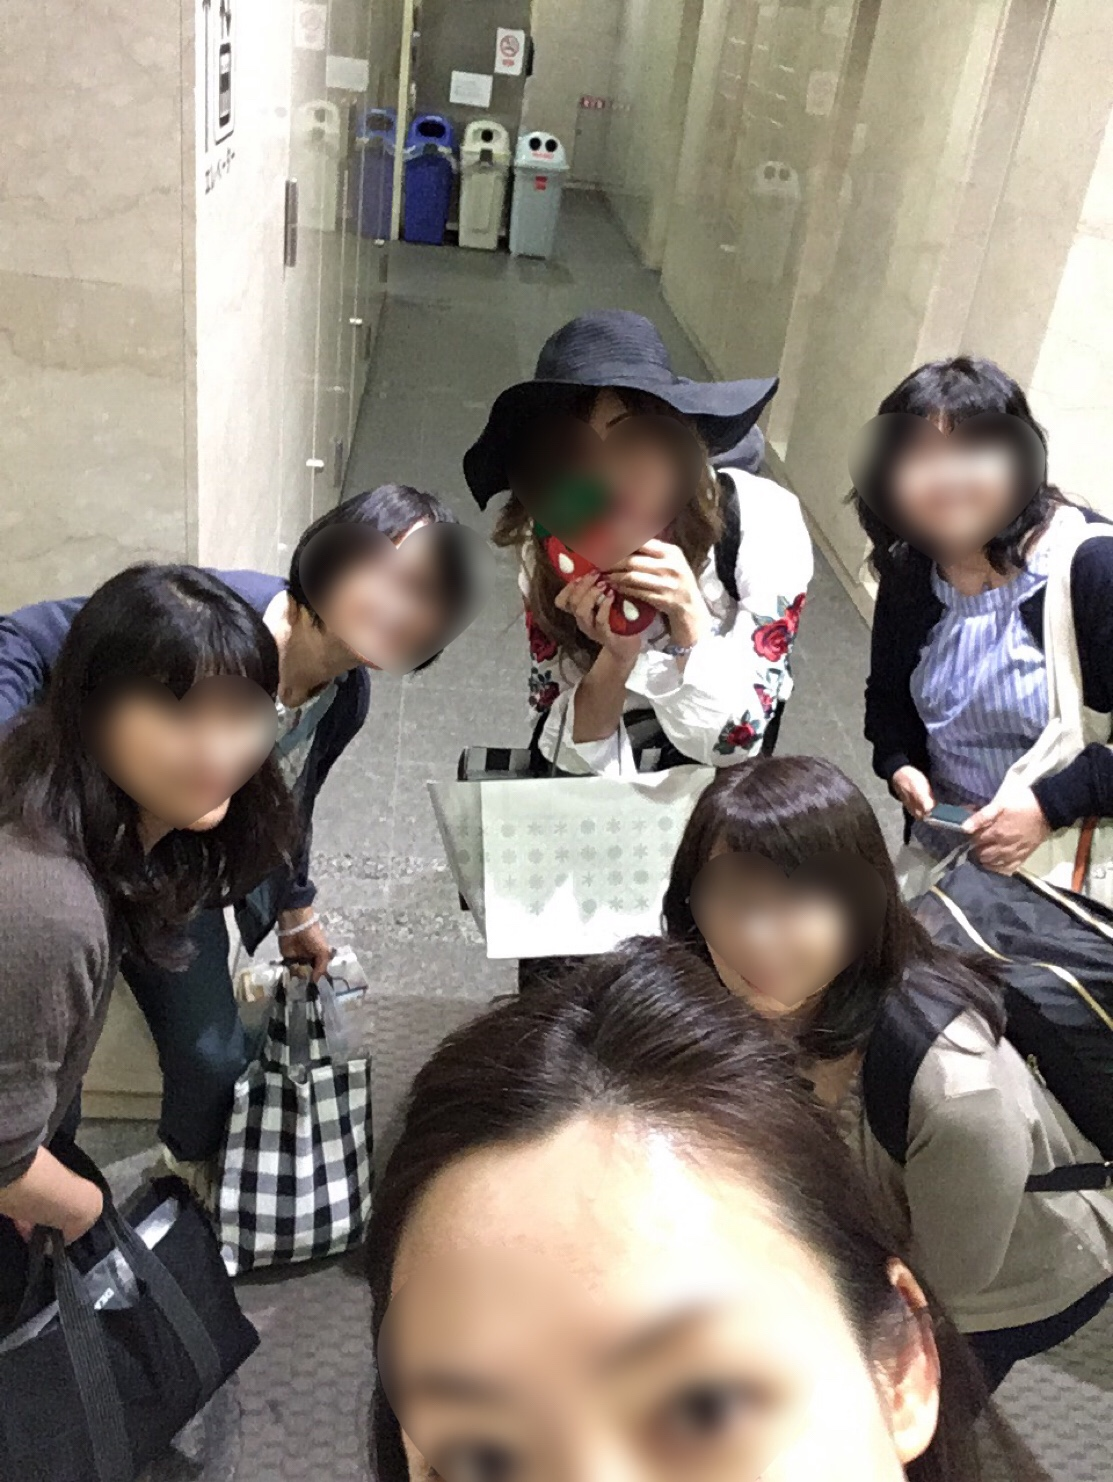 img 7621 - ナインハピネスプロ@in札幌合宿